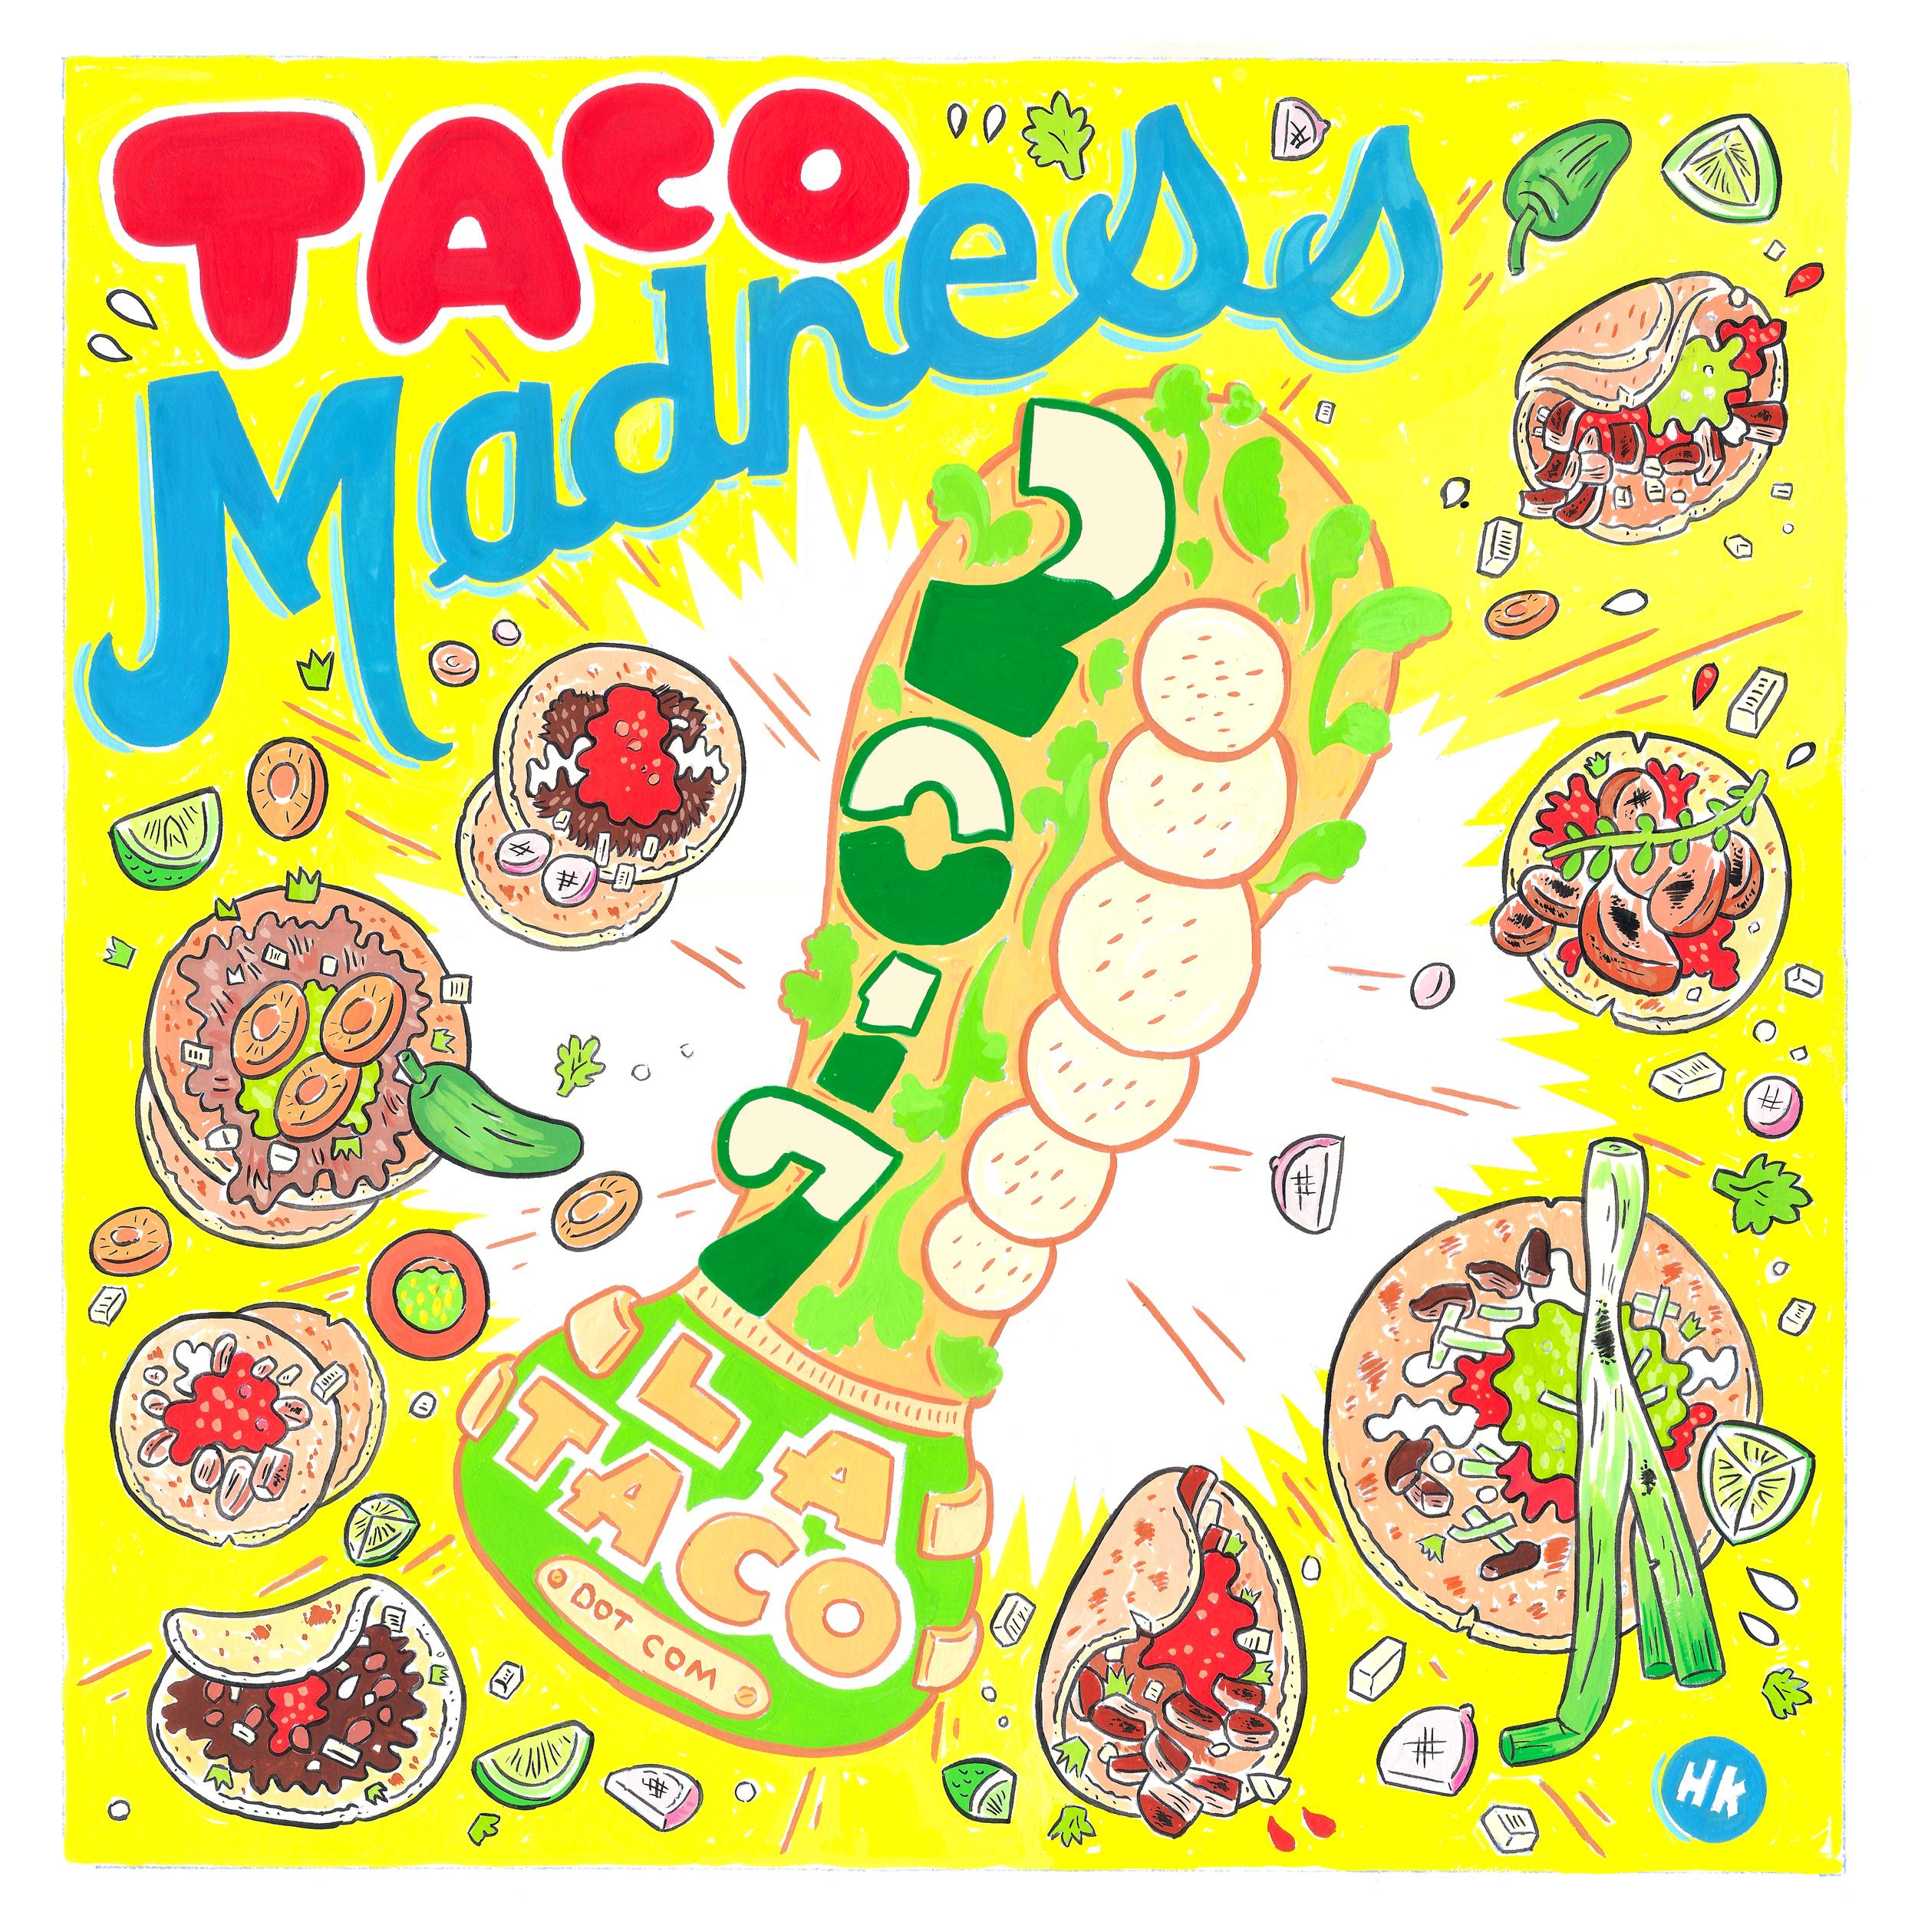 Yay best shrimp tacos clipart jpg royalty free library Taco Madness 2017 ~ L.A. TACO jpg royalty free library